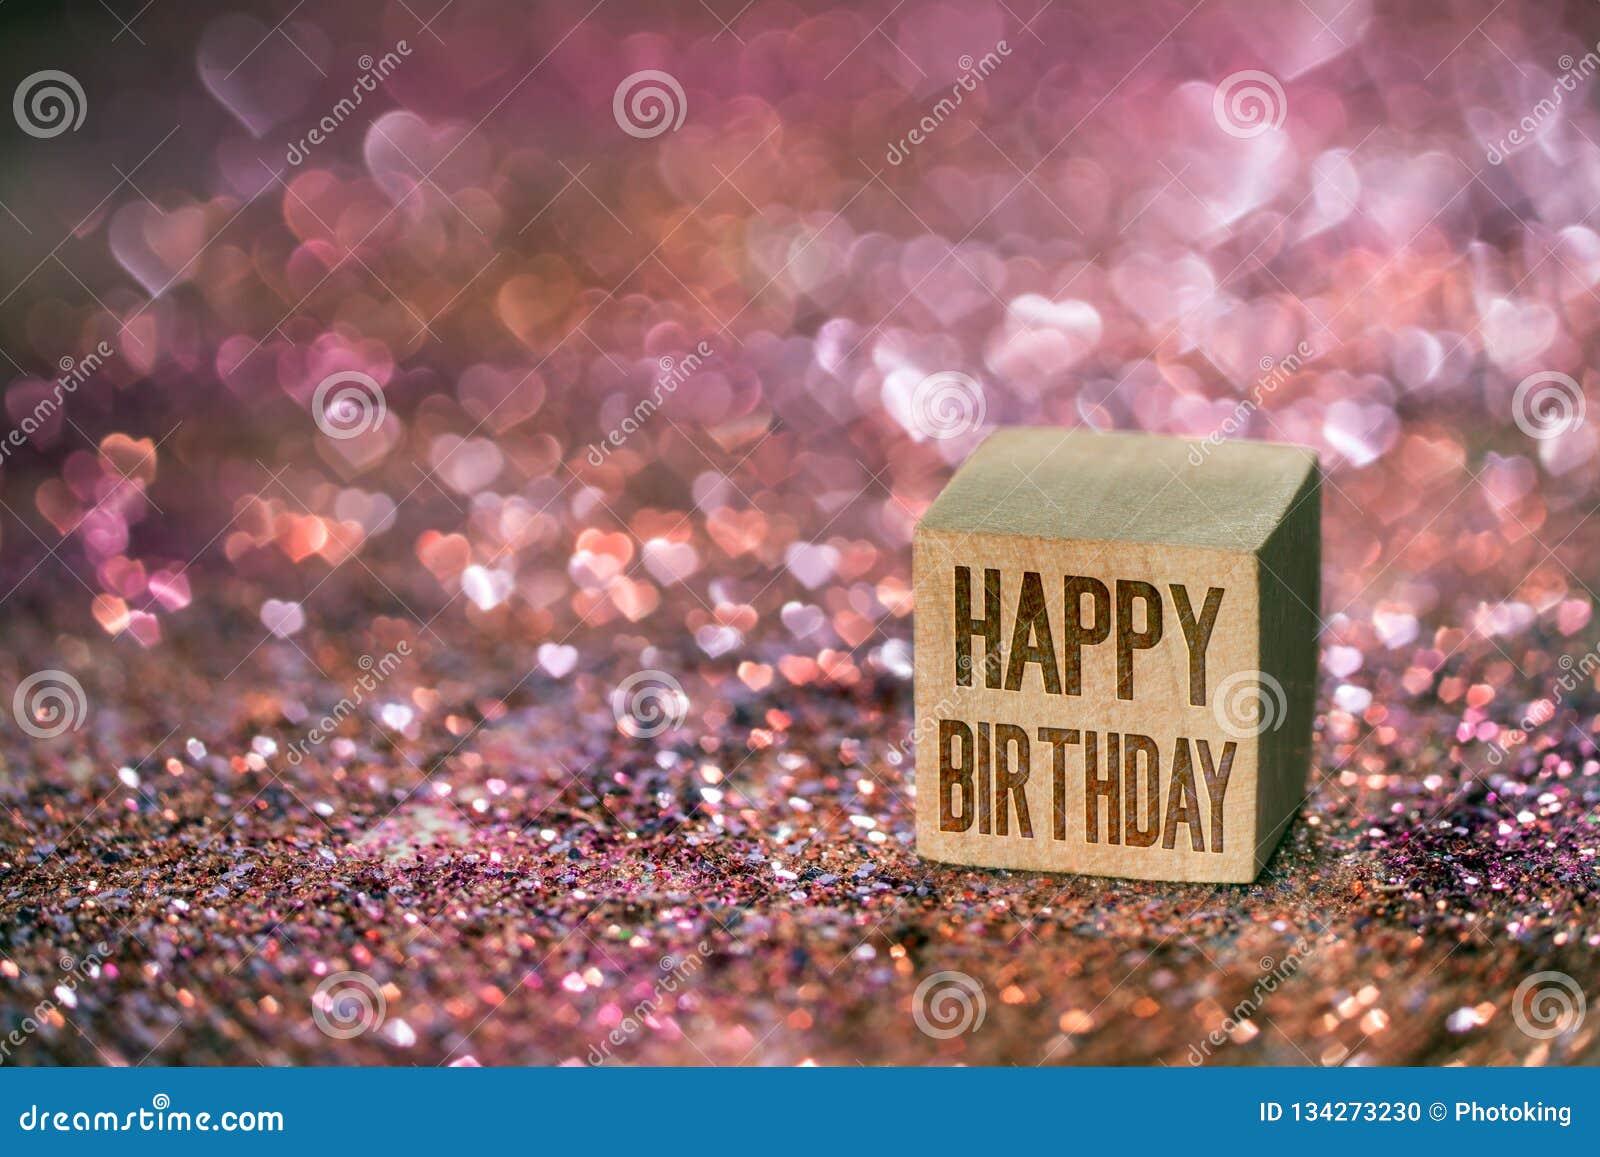 443 770 Happy Birthday Photos Free Royalty Free Stock Photos From Dreamstime